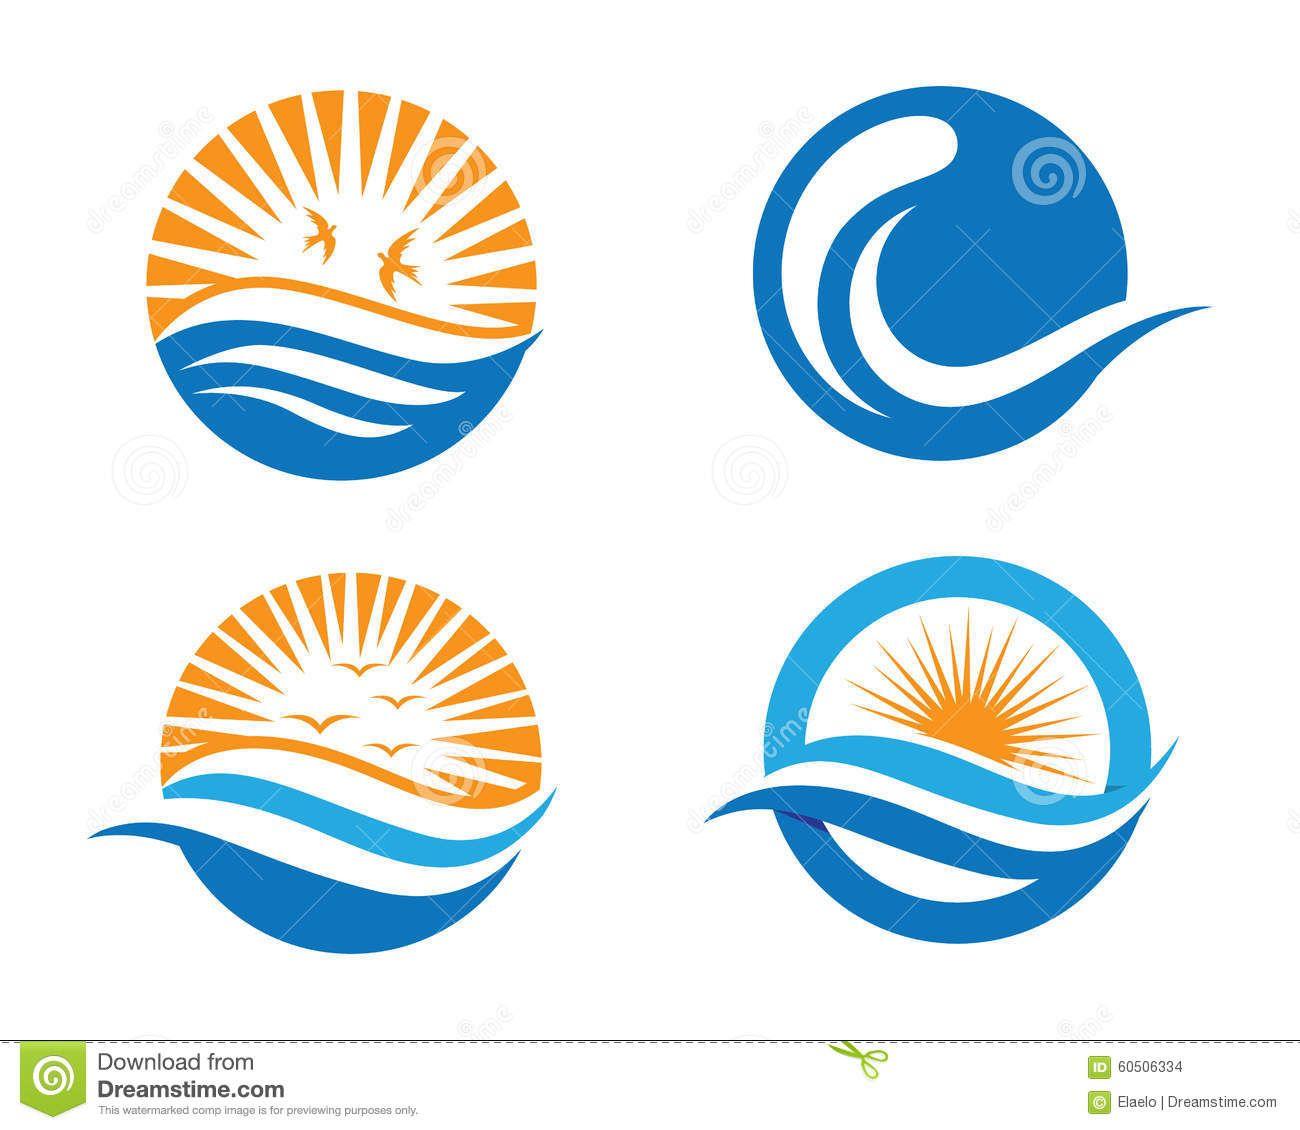 Ocean wave logo stock. Beach clipart symbol